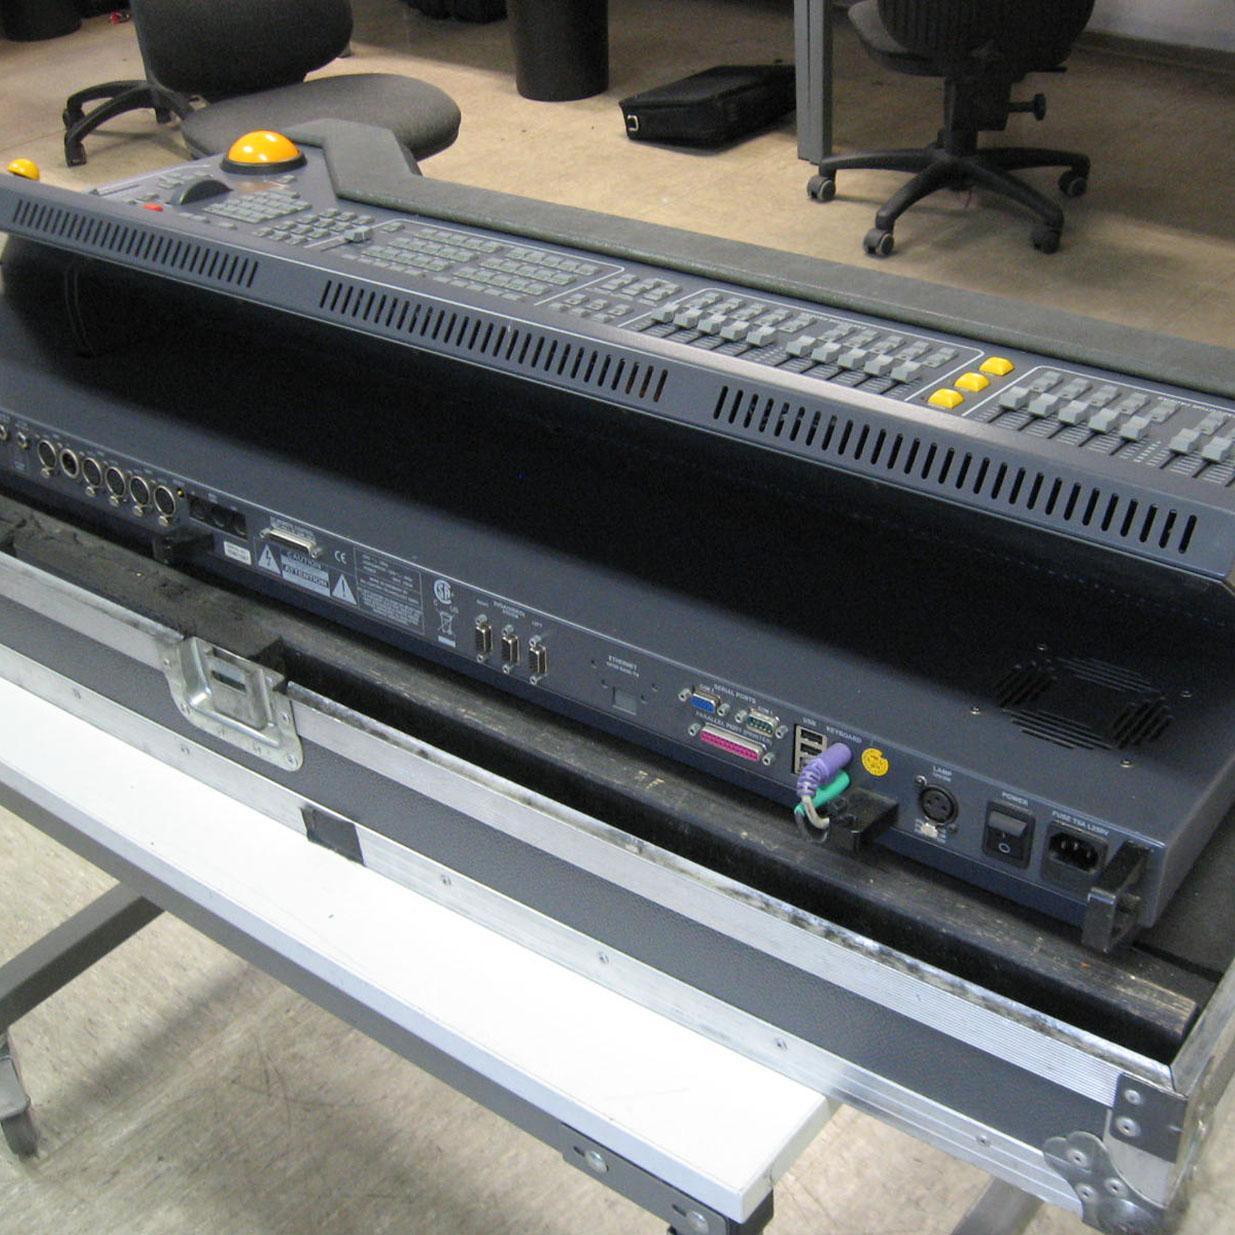 ... MA Lighting GrandMA Full Size Console ... & PRG Proshop - MA Lighting GrandMA Full Size Console azcodes.com